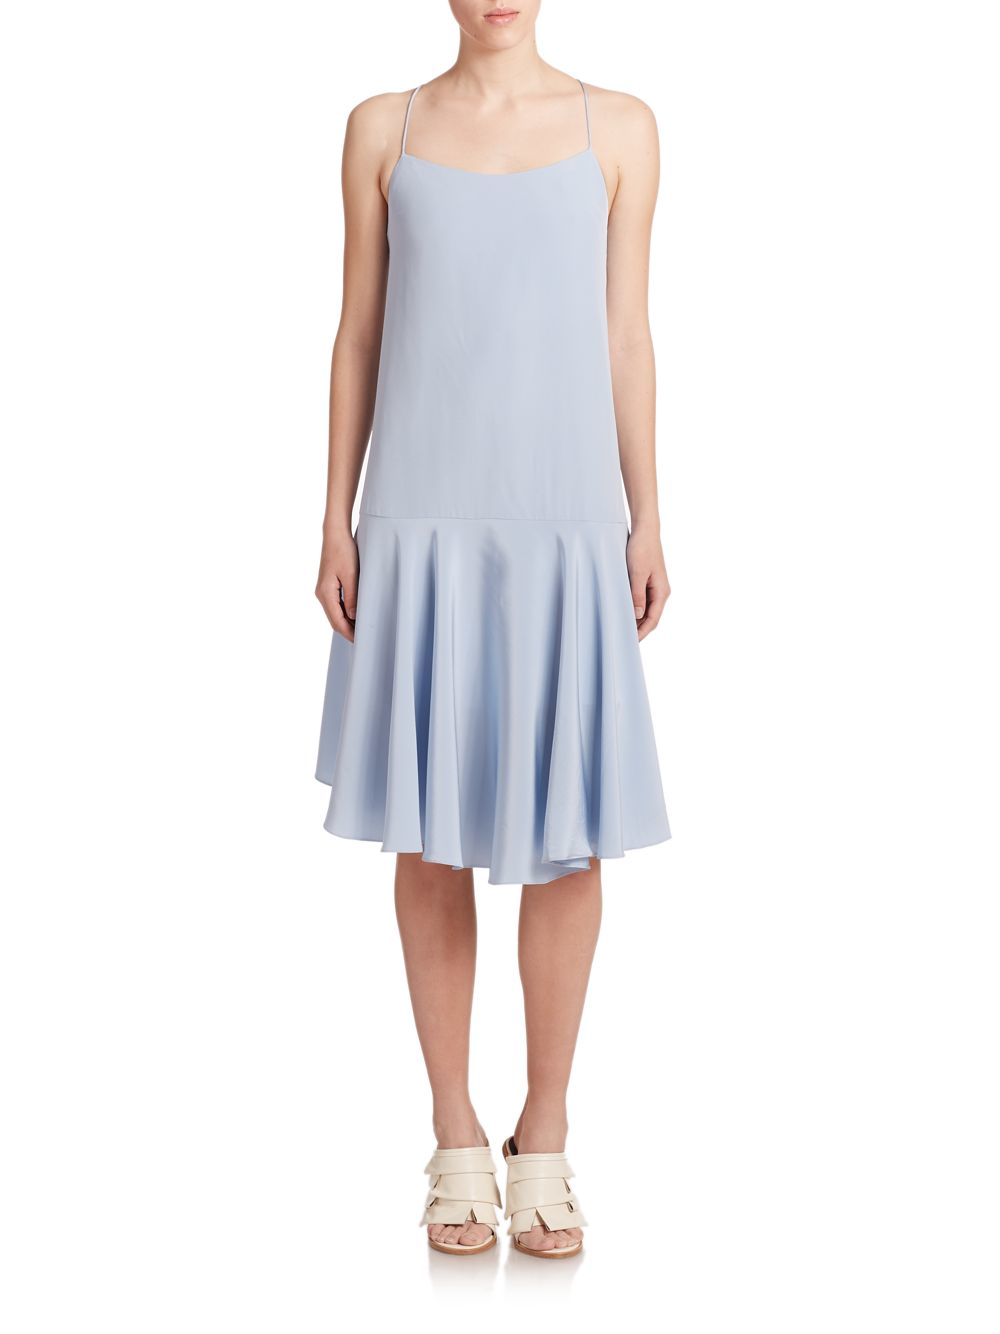 Tibi Heavy Silk Drop-waist Dress in Blue | Lyst